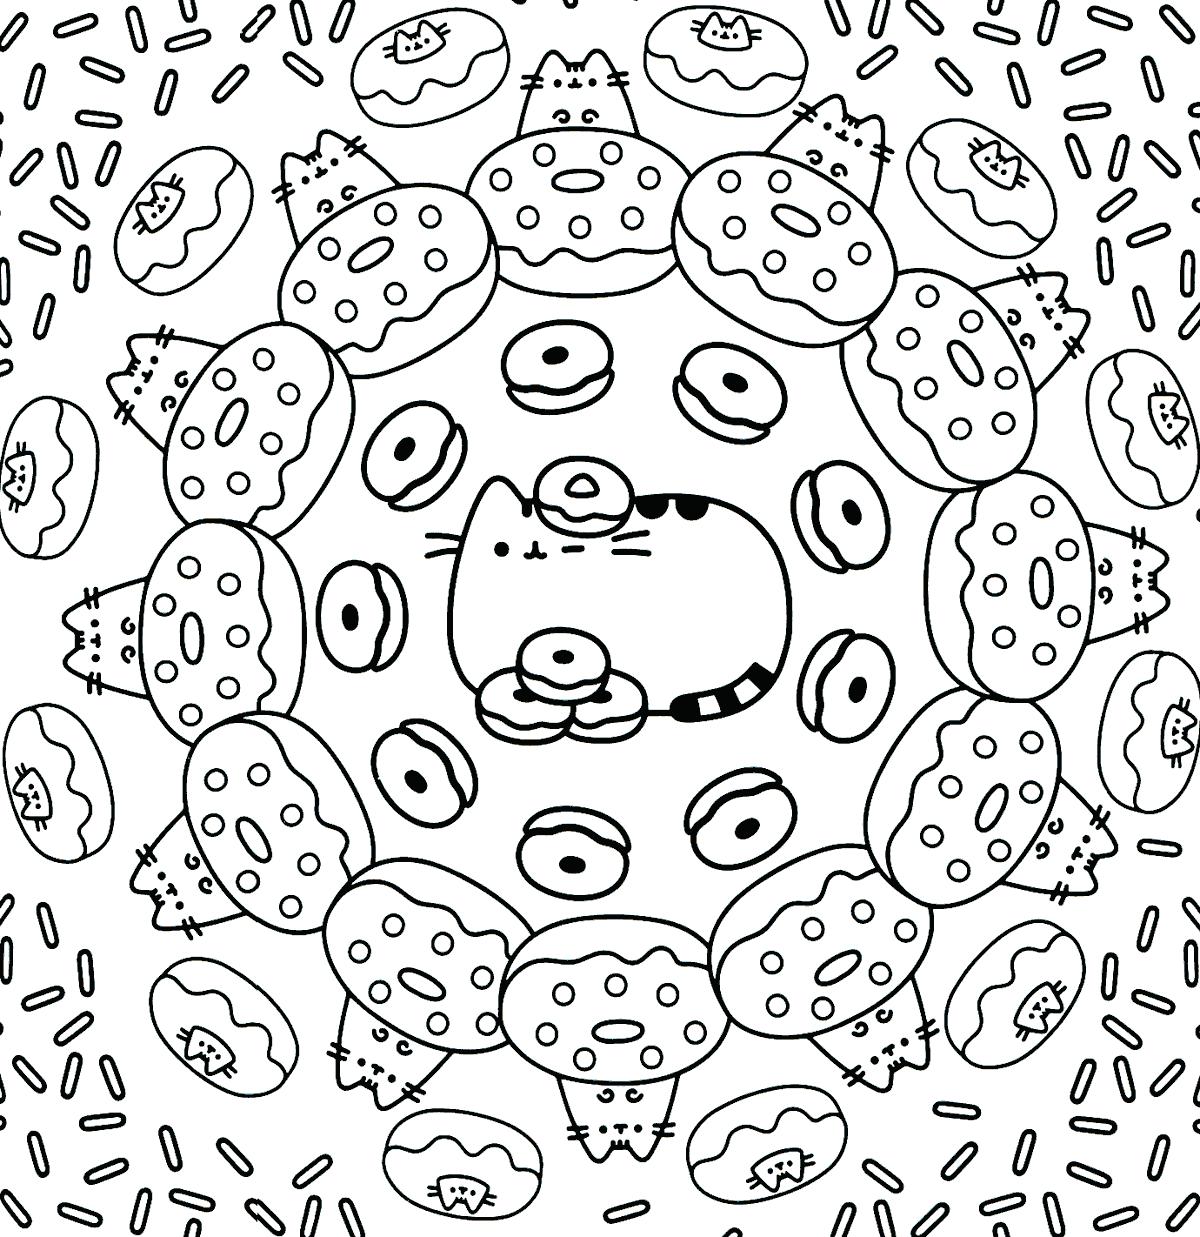 - Pusheen Cat Donut Pattern Coloring Page – Coloring.rocks!